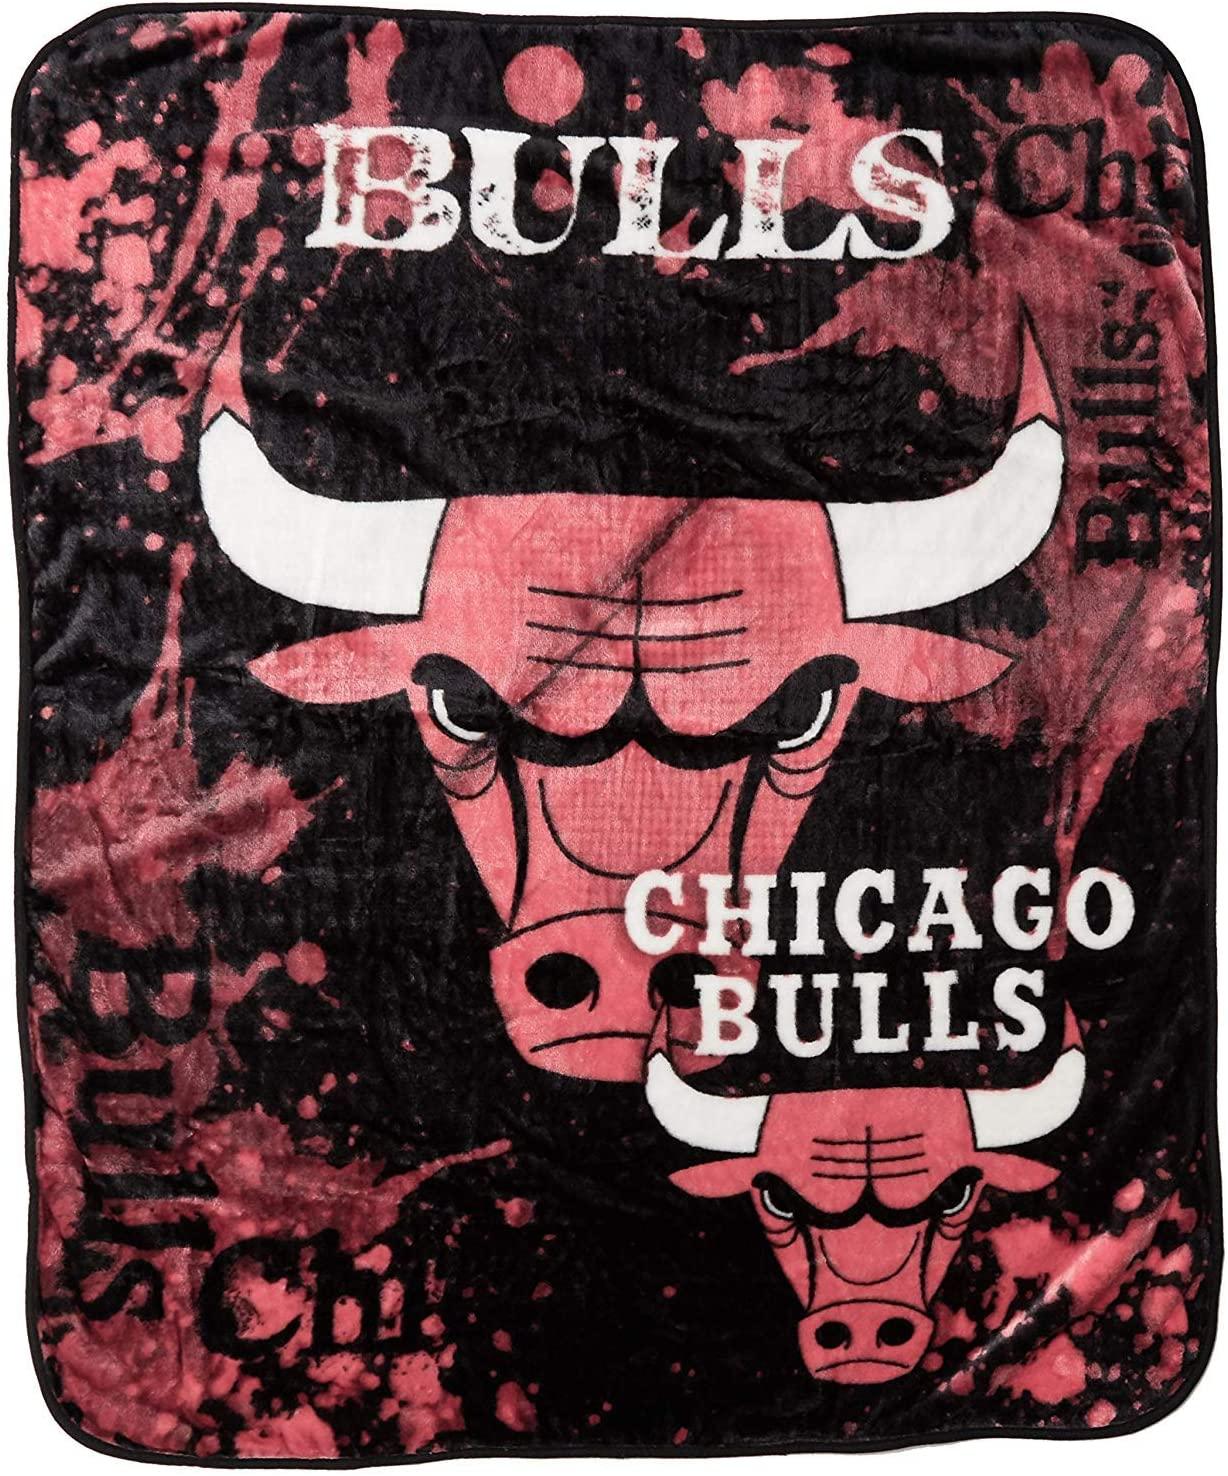 Officially Licensed Nba Throw Chicago Bulls Fleece Blanket